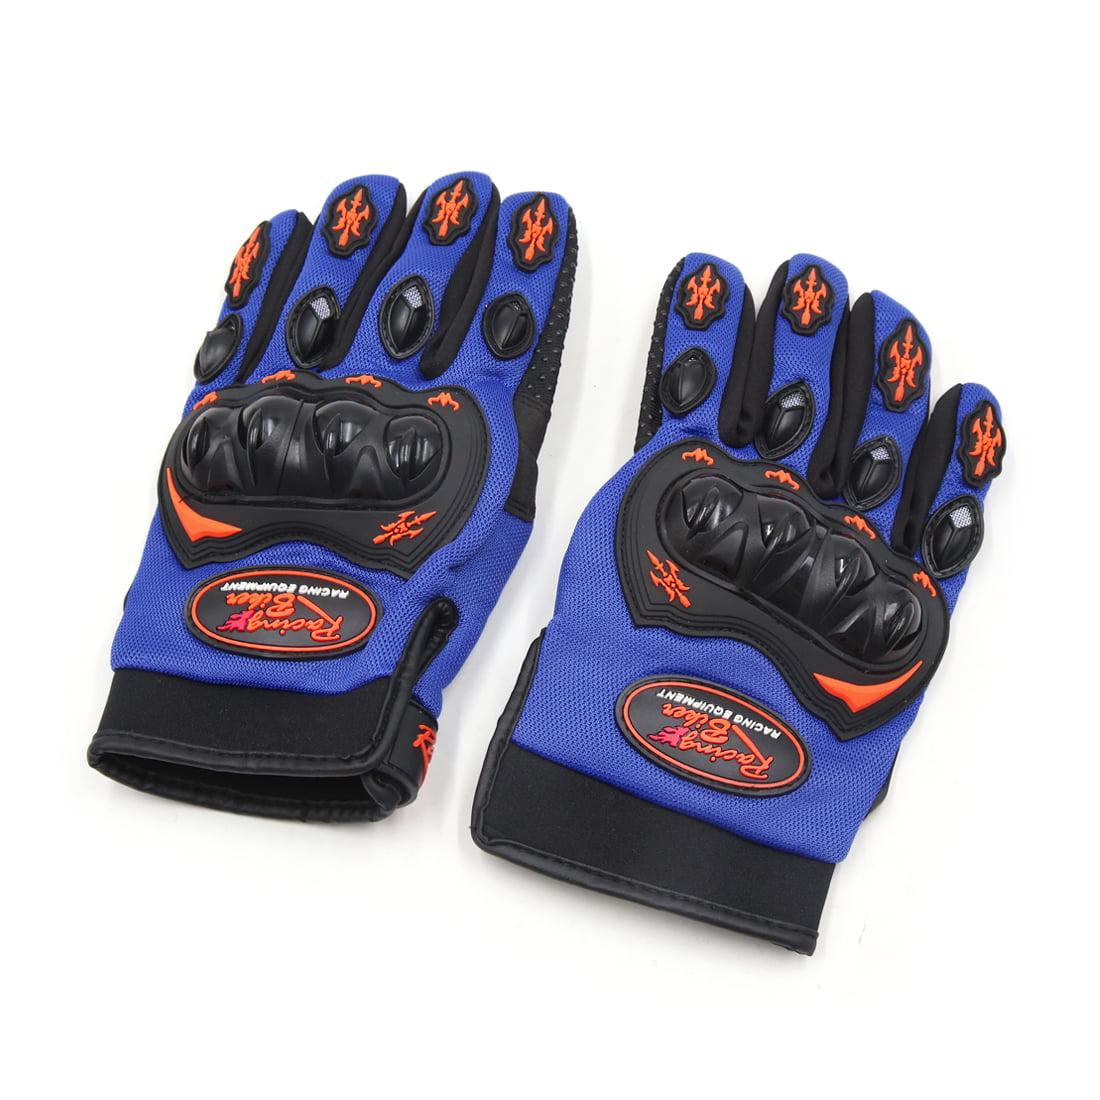 Pair L Size Motorcycle Full Finger Nonslip Loop Fastener Racing Gloves Blue